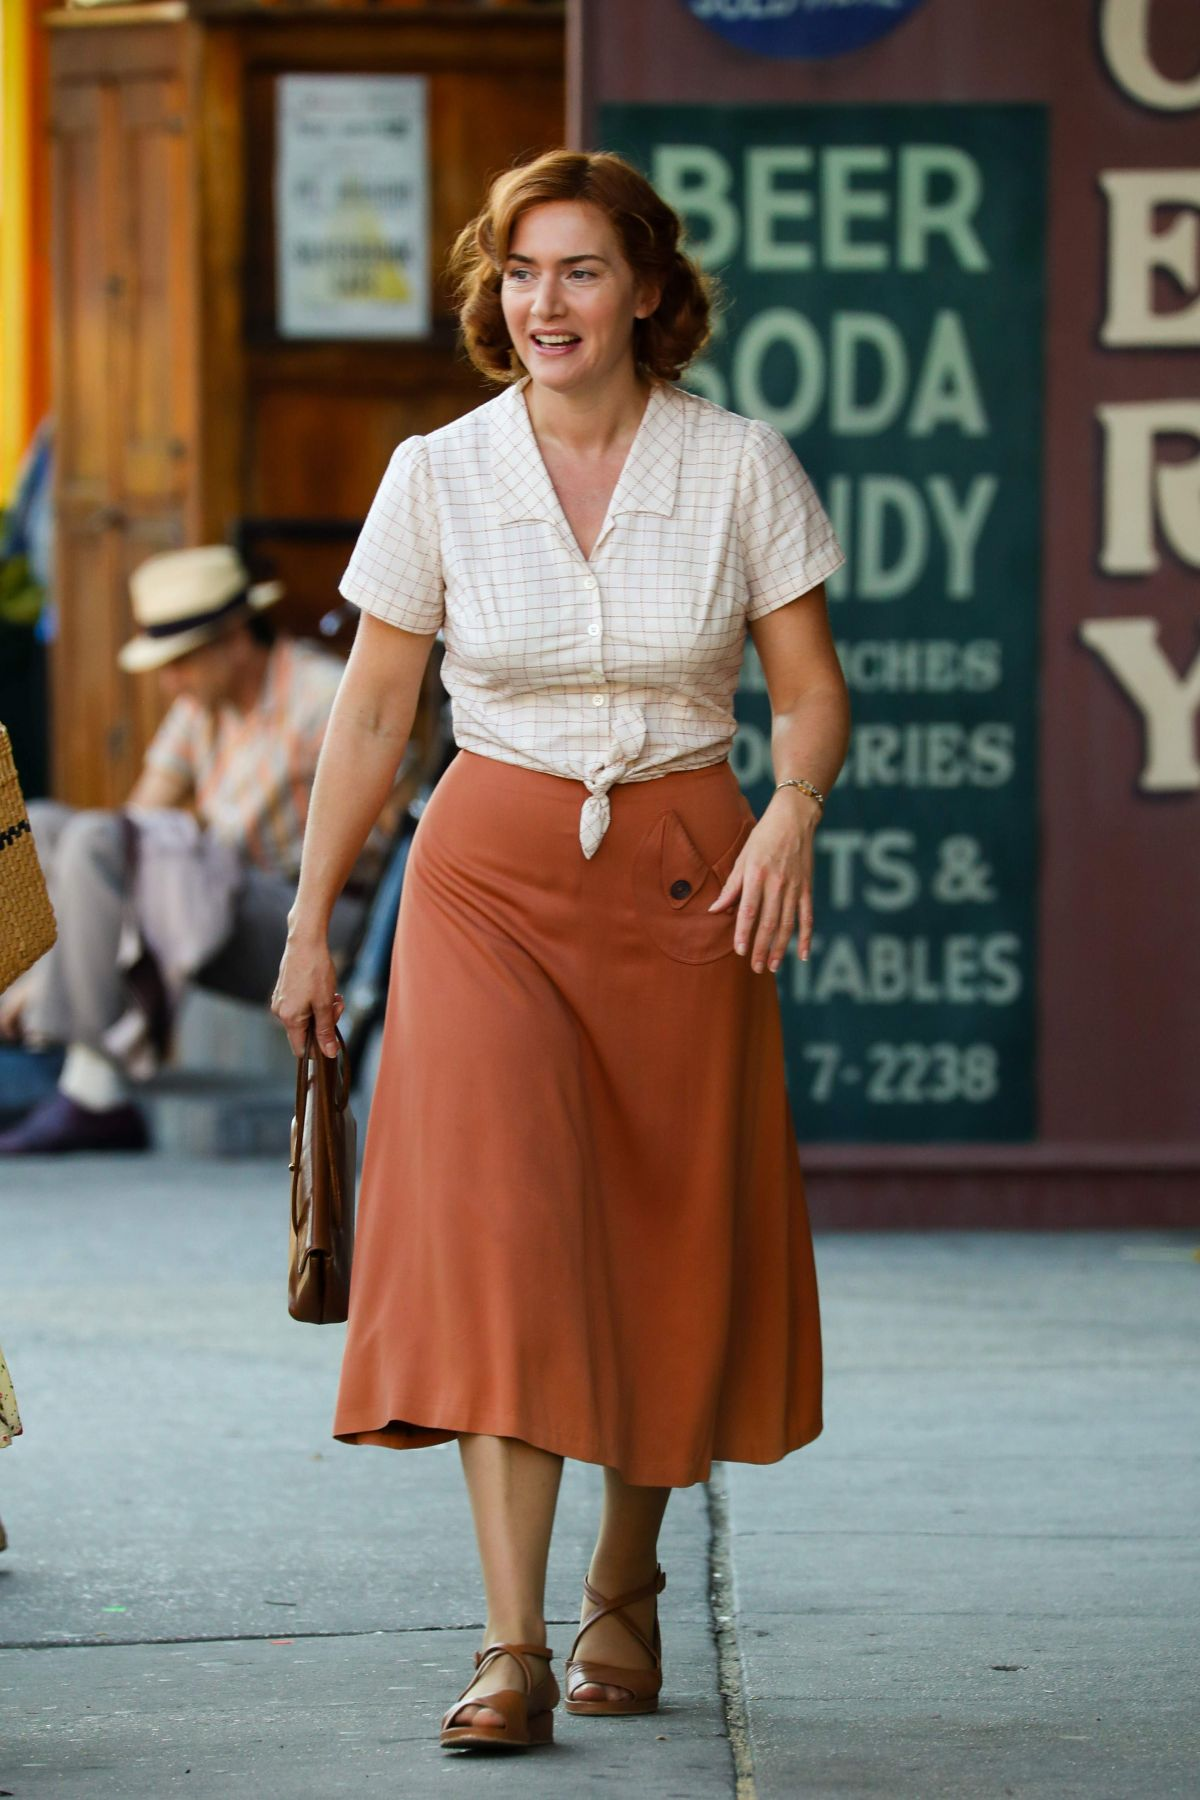 kate winslet essay Film critic mark harris runs down the actress's finest screen performances.